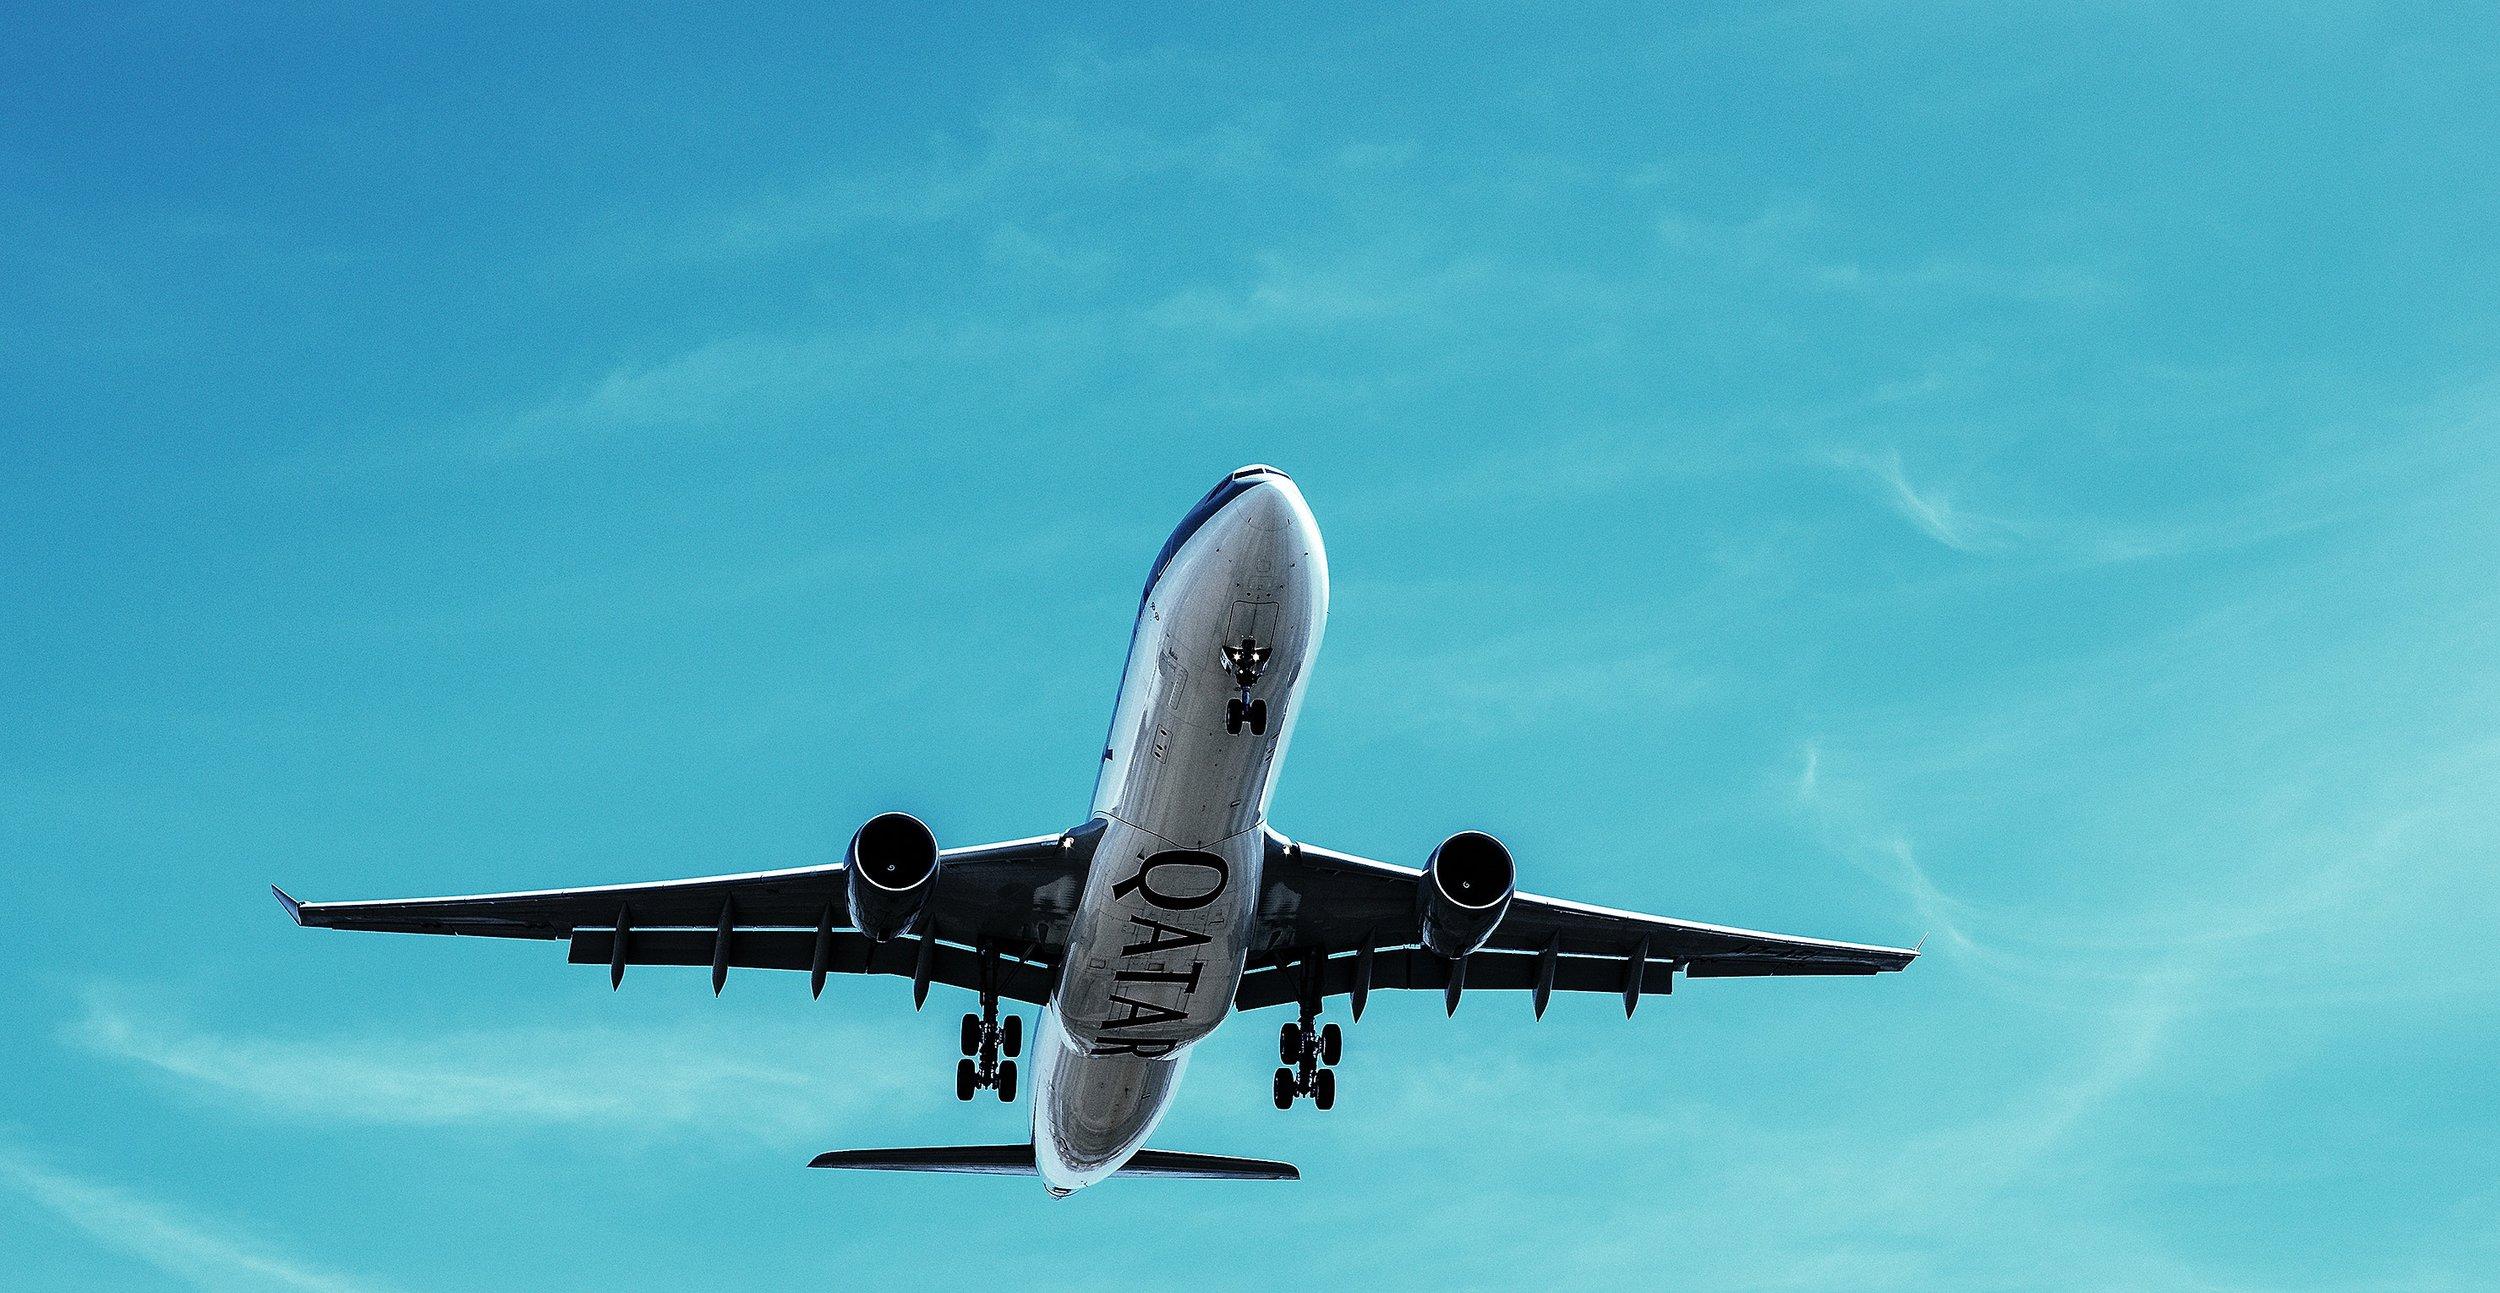 aerial-aircraft-airline-674783.jpg